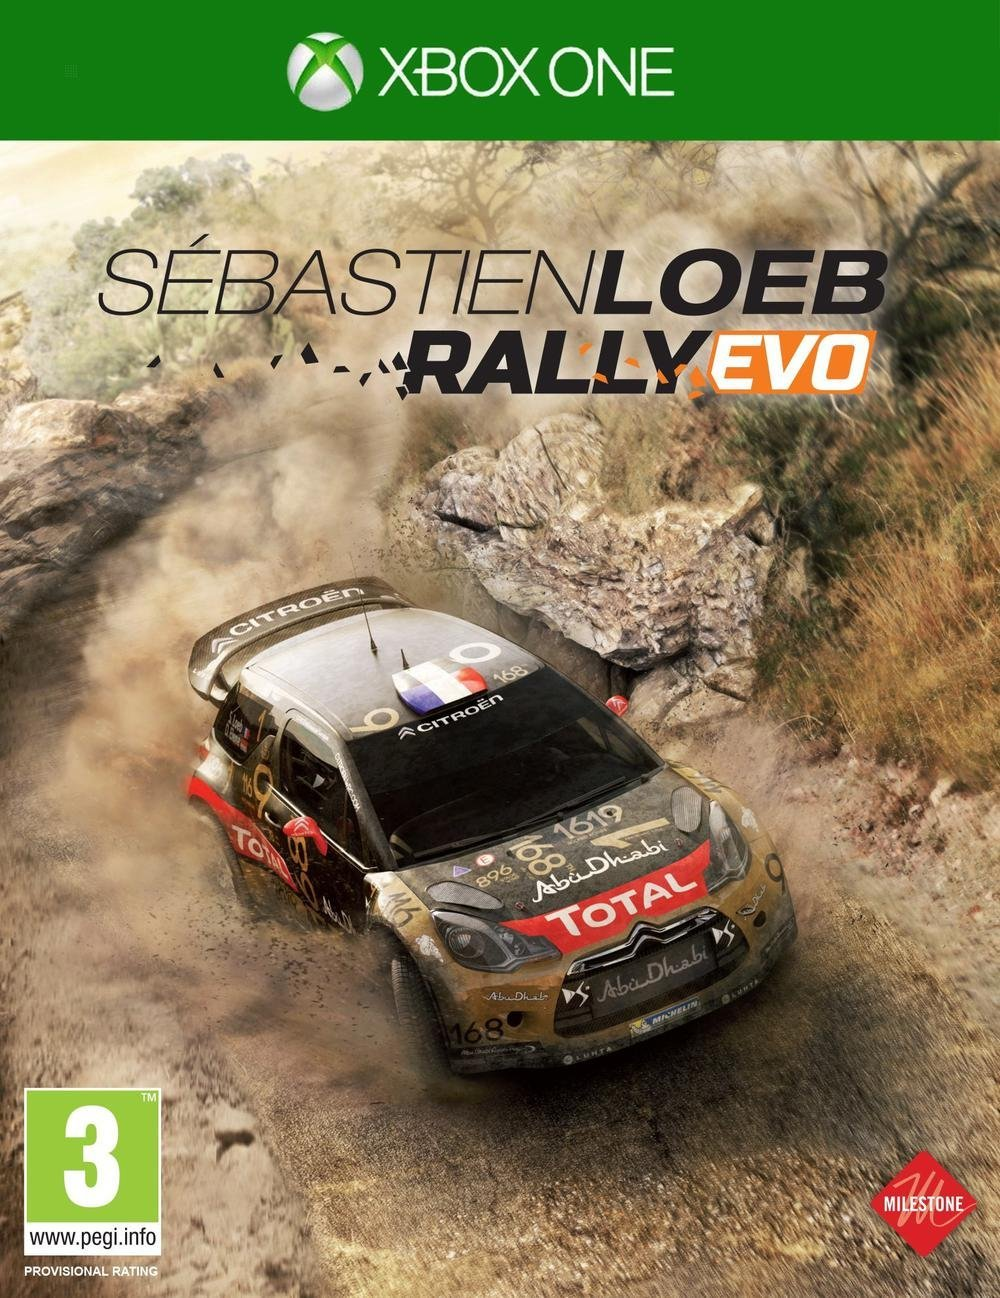 Sebastien Loeb Rally Evo 81huq310